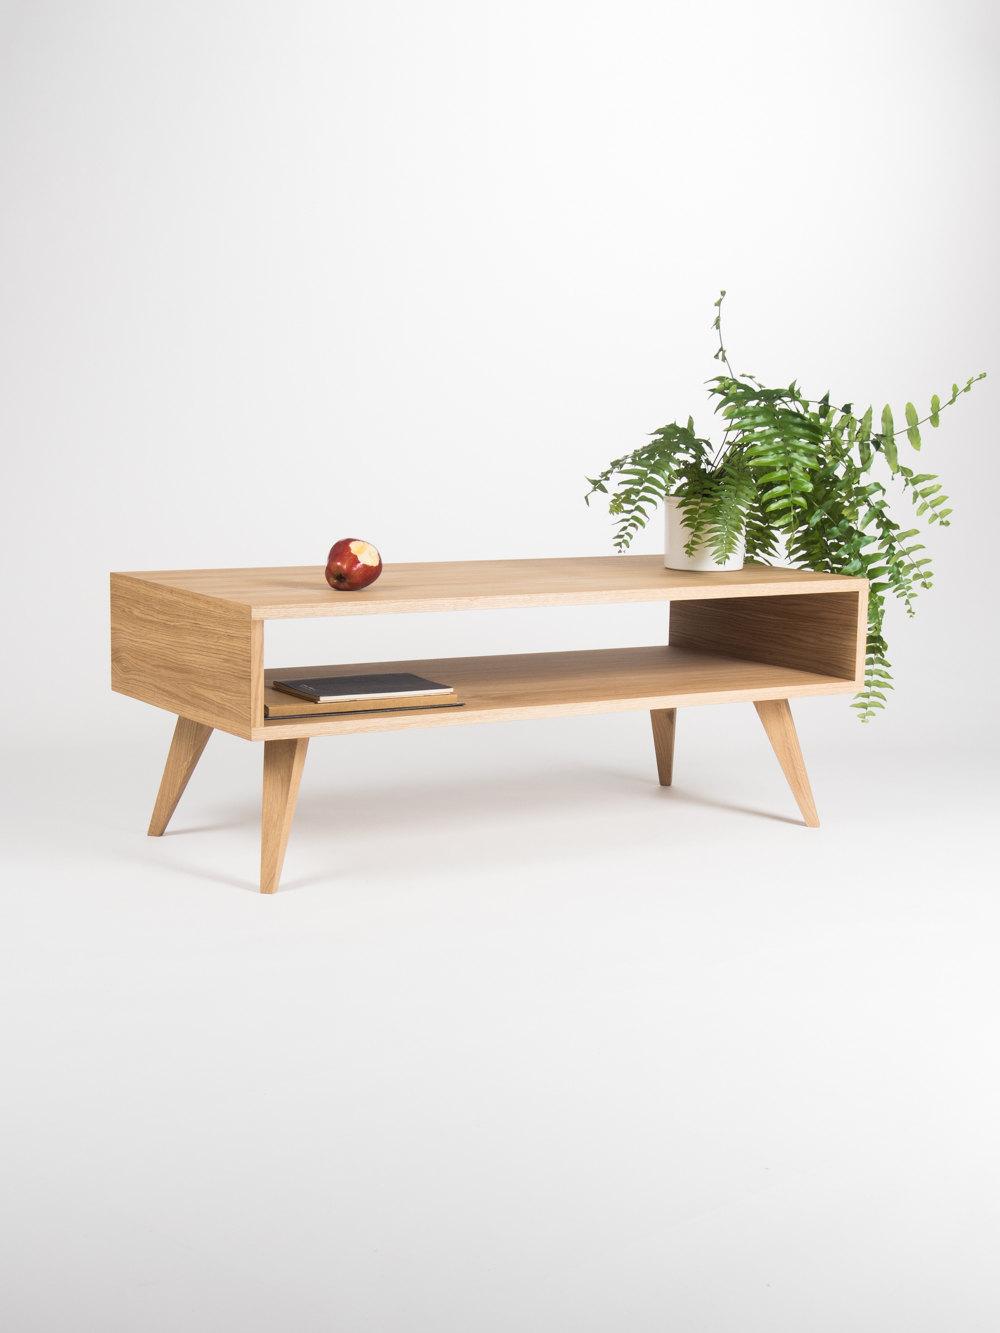 Mid century modern coffee table, box sofa table, made of oak wood on ...